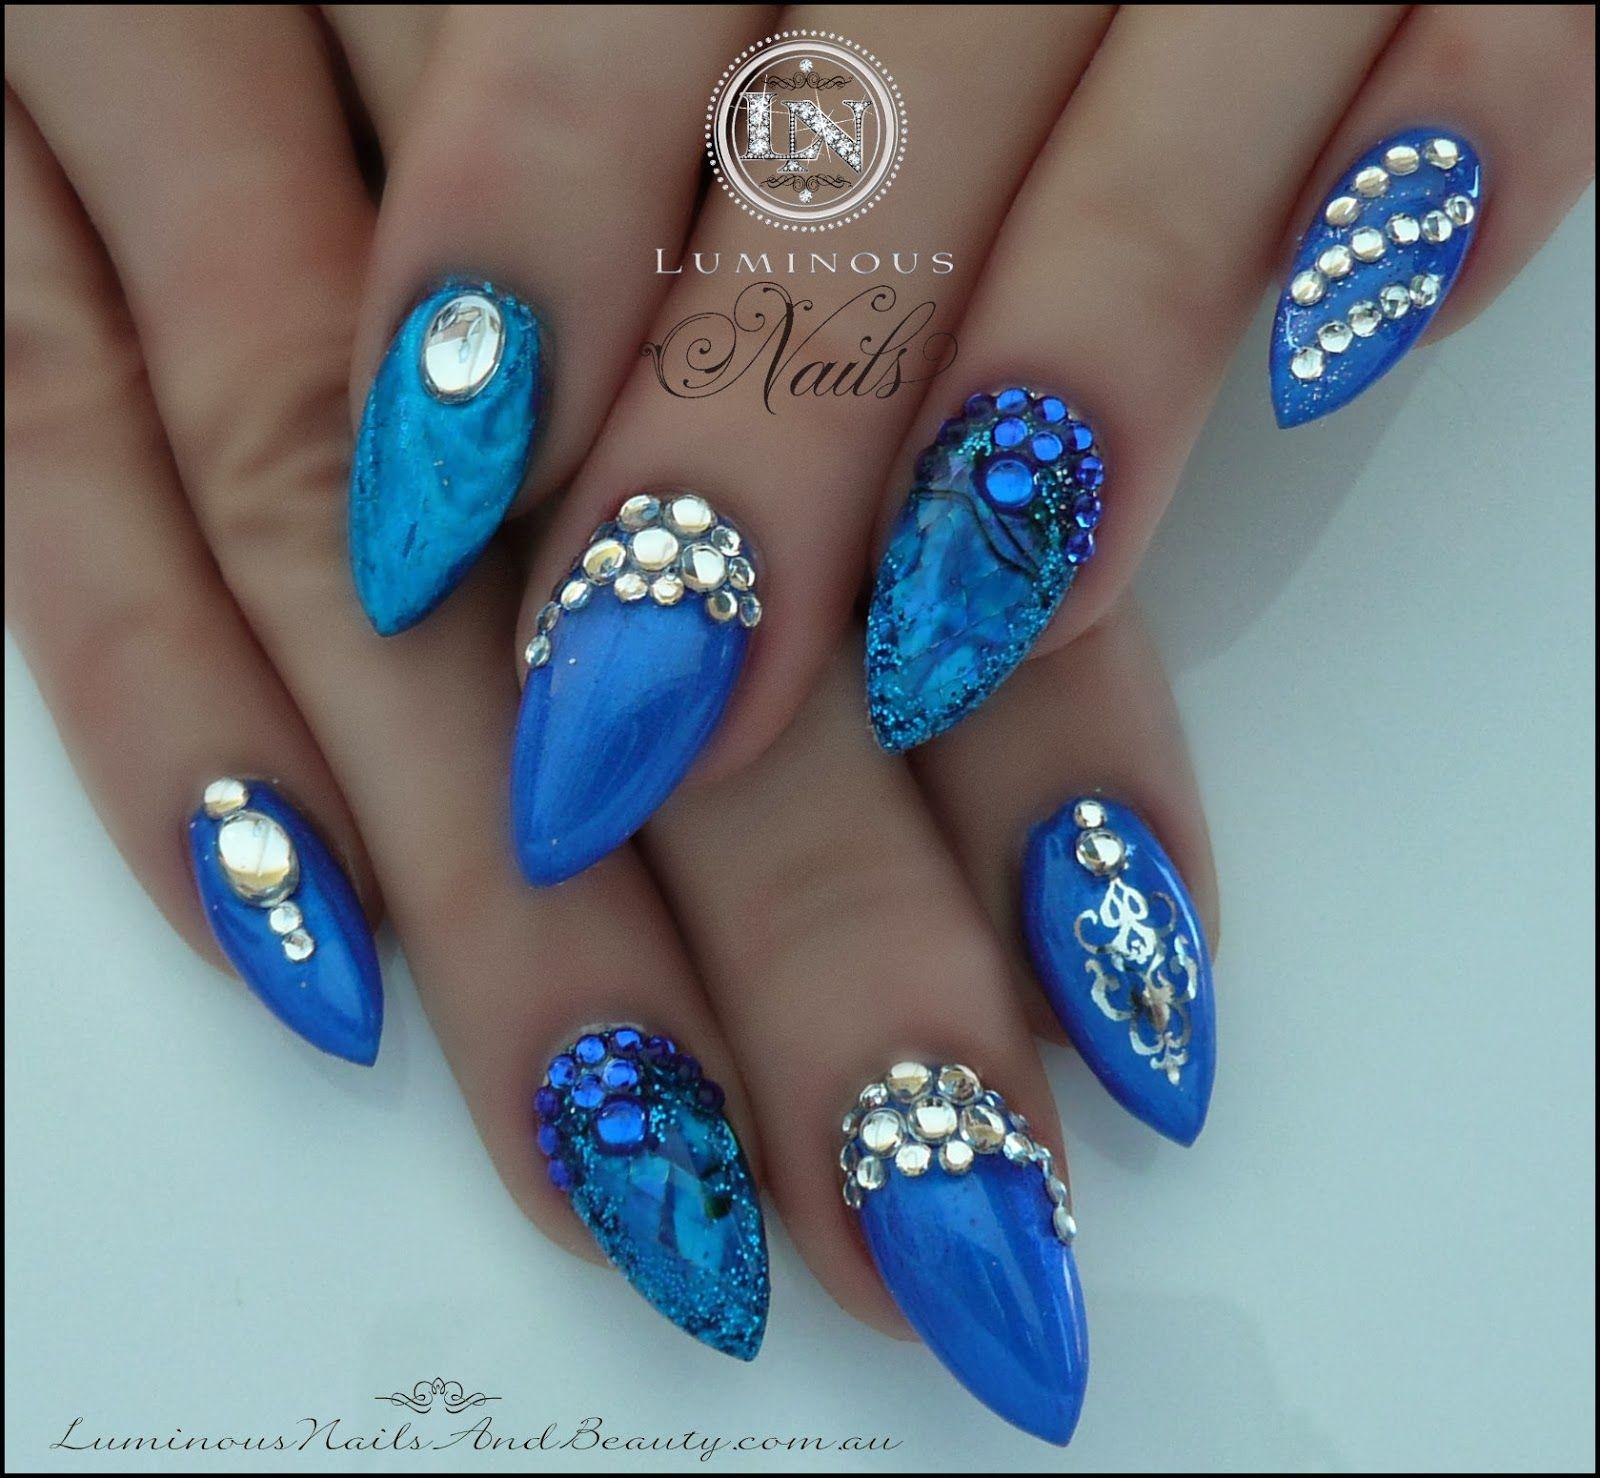 Luminous Nails   Nail Art   Pinterest   Luminous nails, Art nails ...